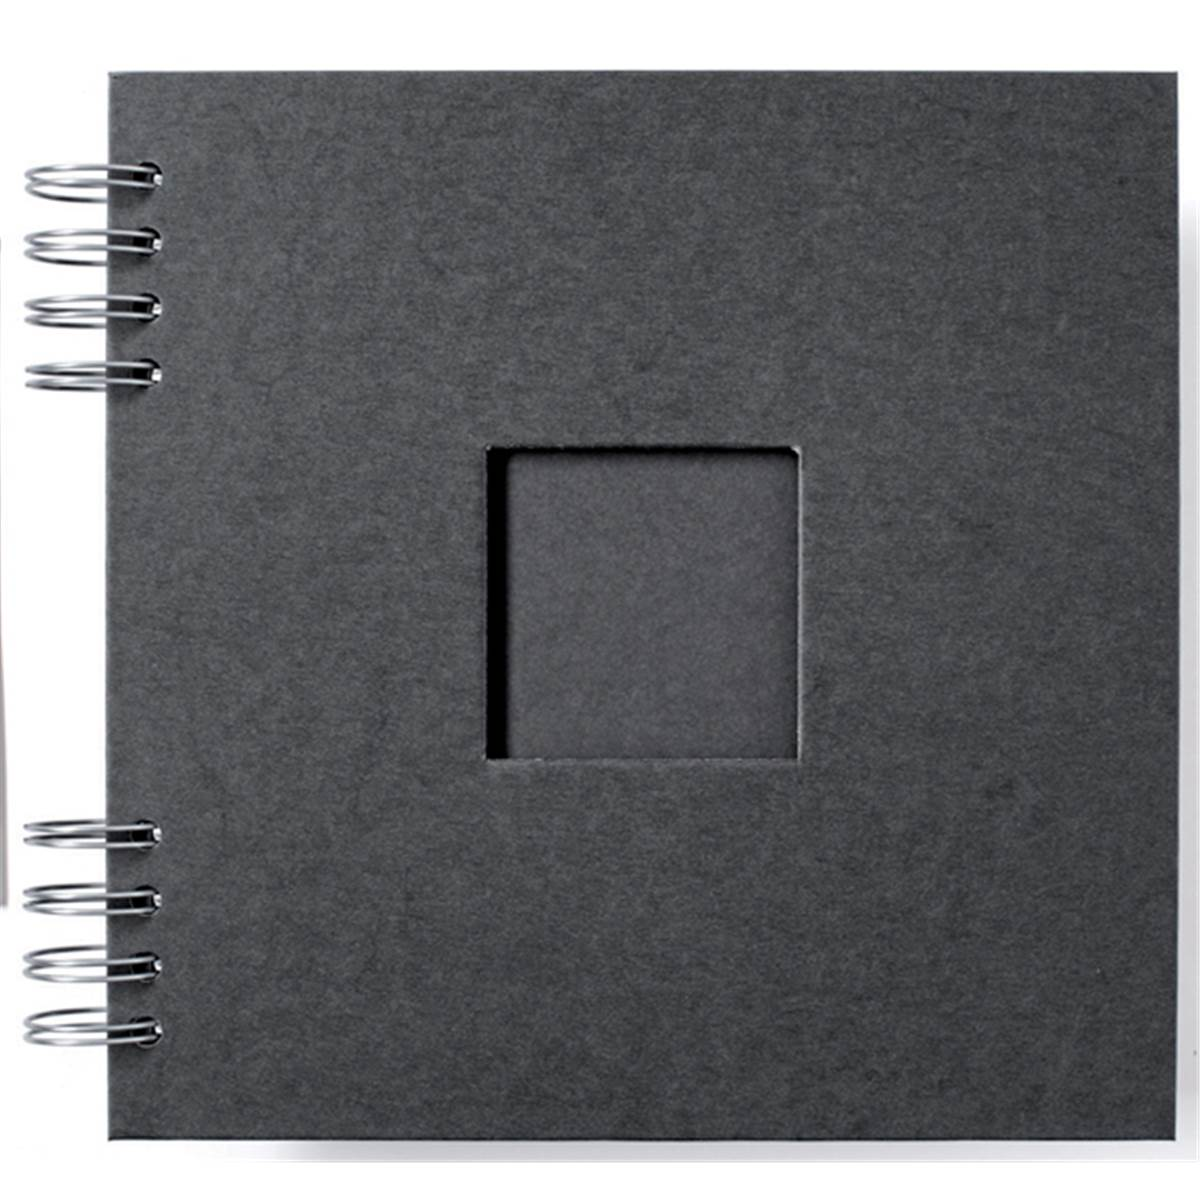 prat album photo marmara noir 27x27 30 feuillets prophot. Black Bedroom Furniture Sets. Home Design Ideas